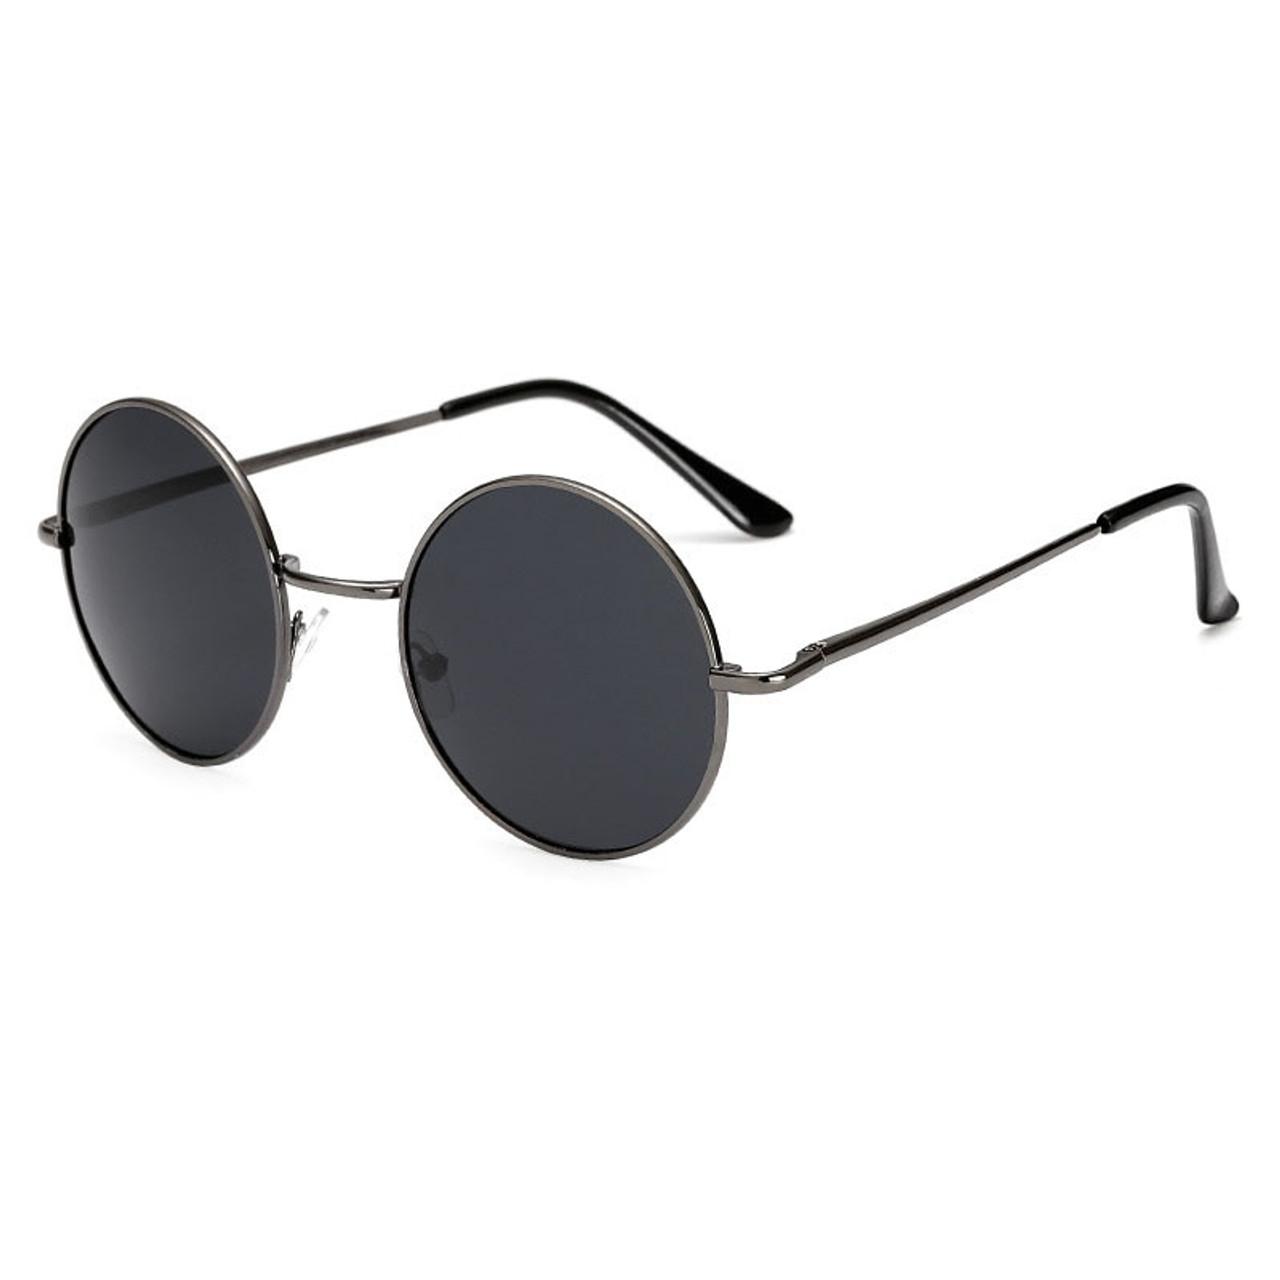 1fecc25d3e92 ... Retro Classic Vintage Round Polarized Sunglasses Men Brand Designer Sun  Glasses Women Metal Frame Black lens ...